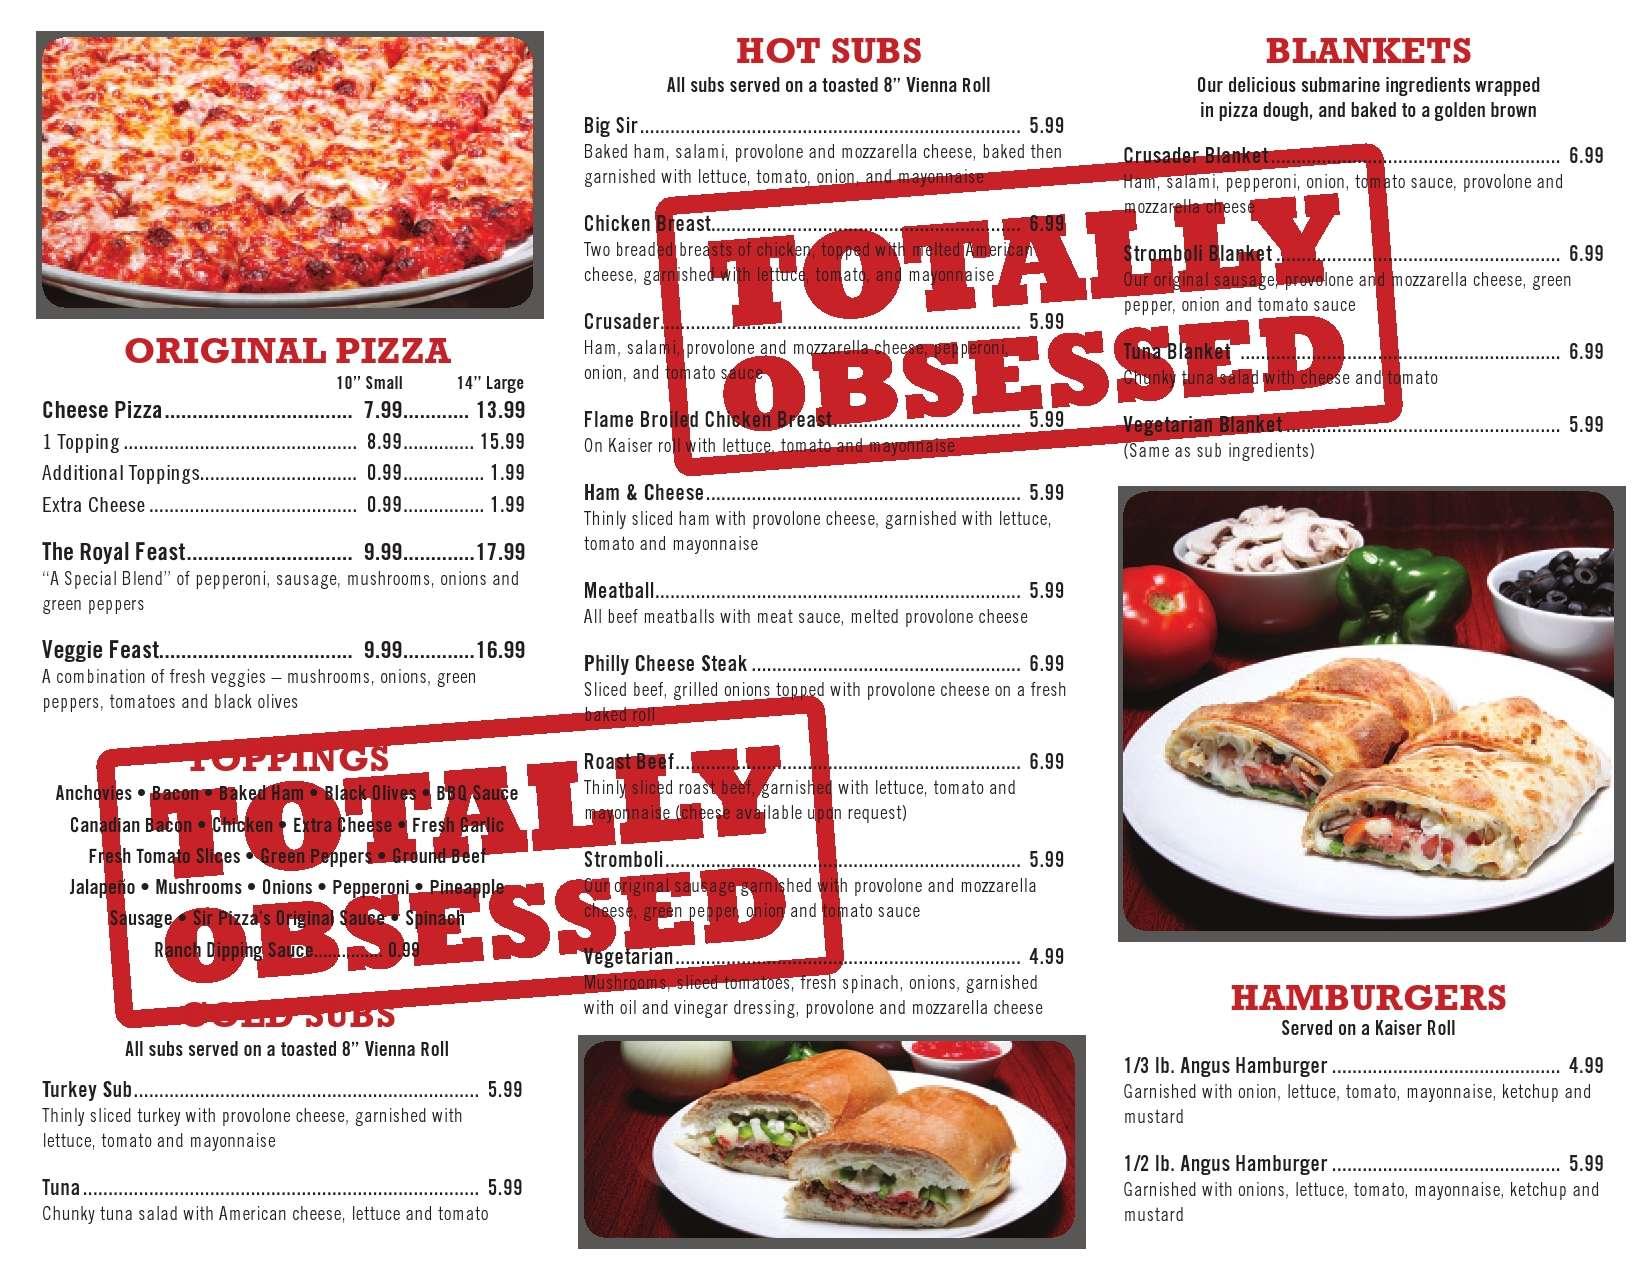 Sir Pizza Menu, Menu for Sir Pizza, Hialeah, Miami - Urbanspoon/Zomato